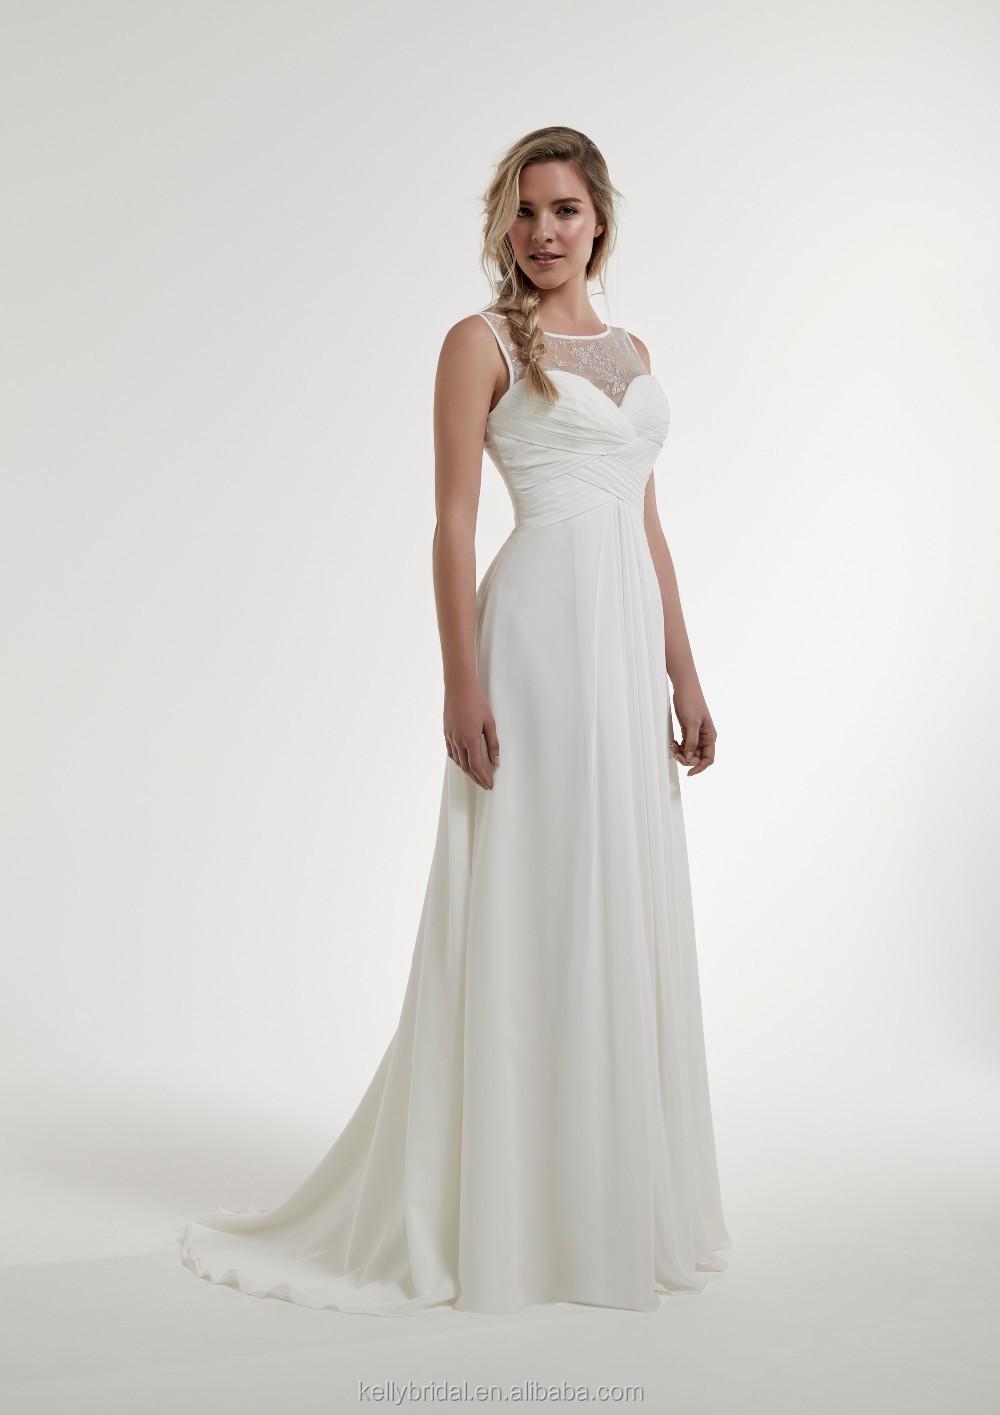 Zm16139 Chiffon Grecian Style Wedding Dresses Pleated Simple High ...